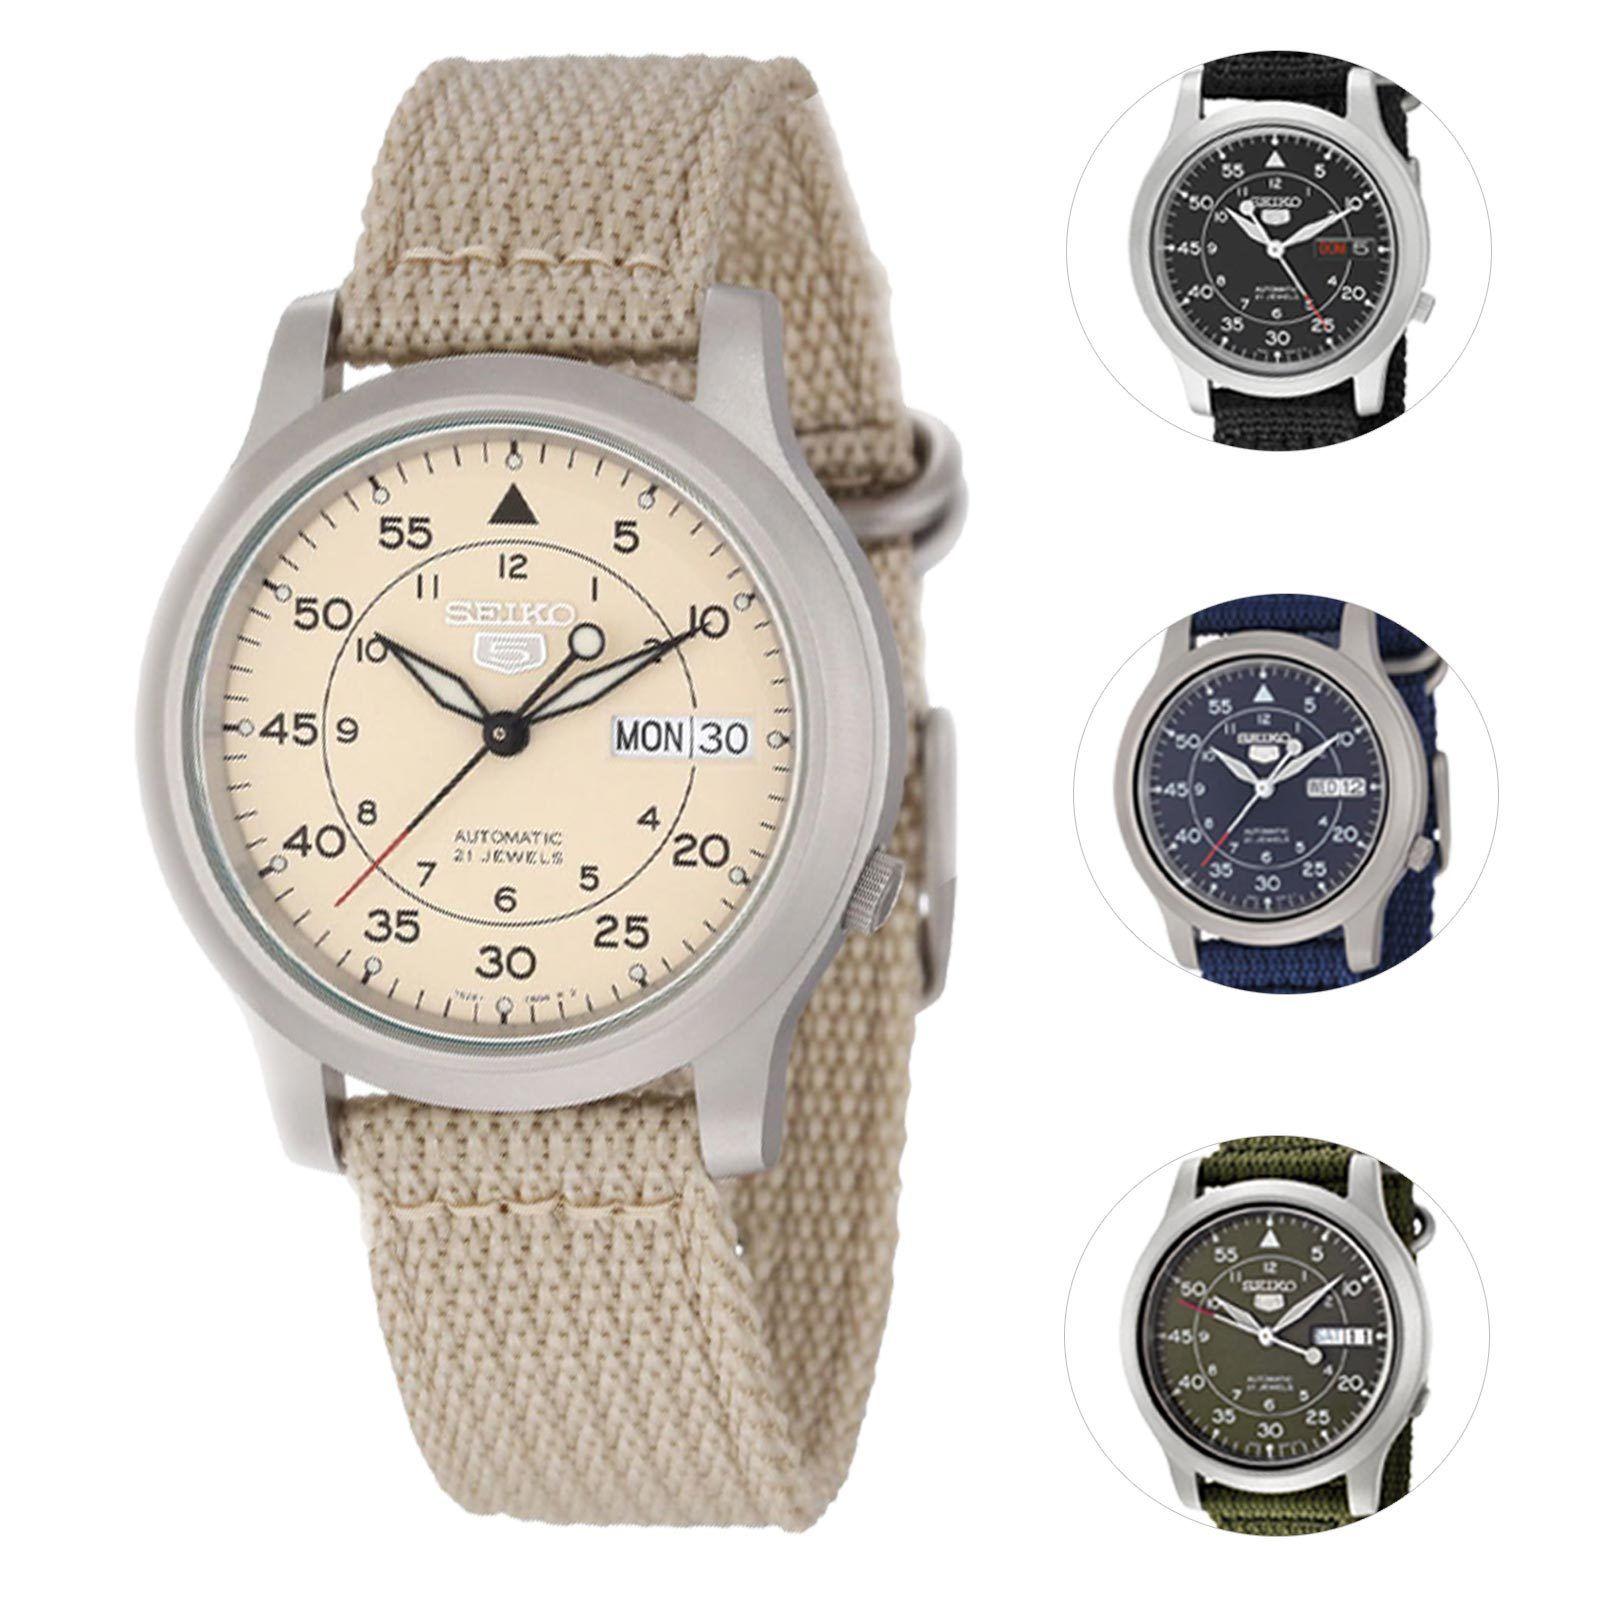 Seiko 5 Men's Automatic Watch $49.99 Free Ship